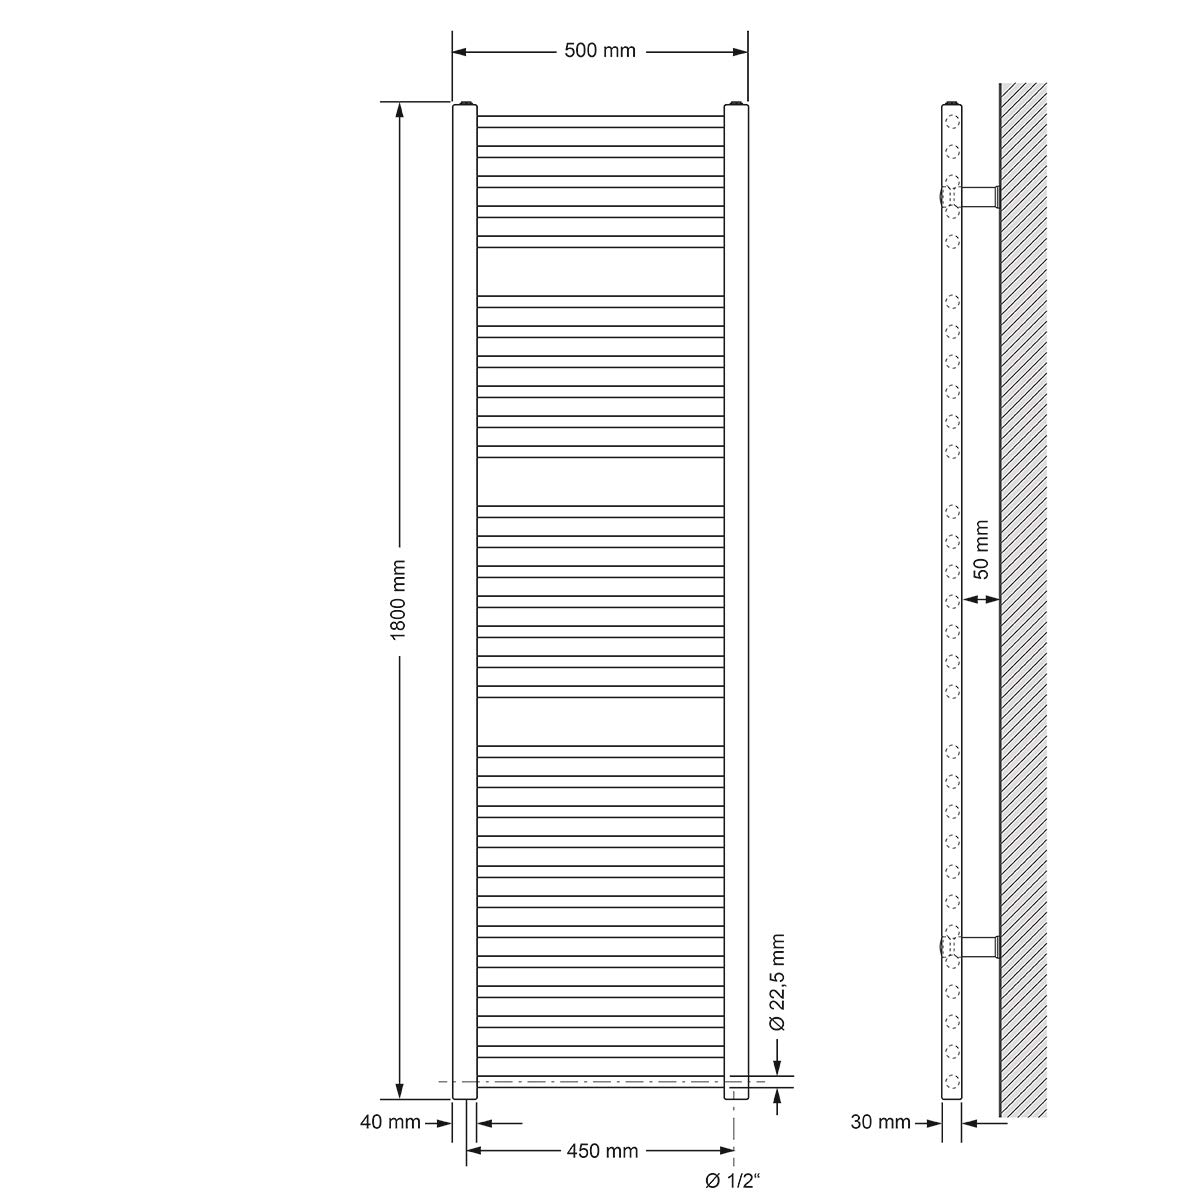 ECD Germany Radiatore Scaldasalviette Sahara Curvo con Chiusura Centrale Radiatore Scaldasalviette Asciugabiancheria 500x1200 mm Cromato 500 x 1200 mm